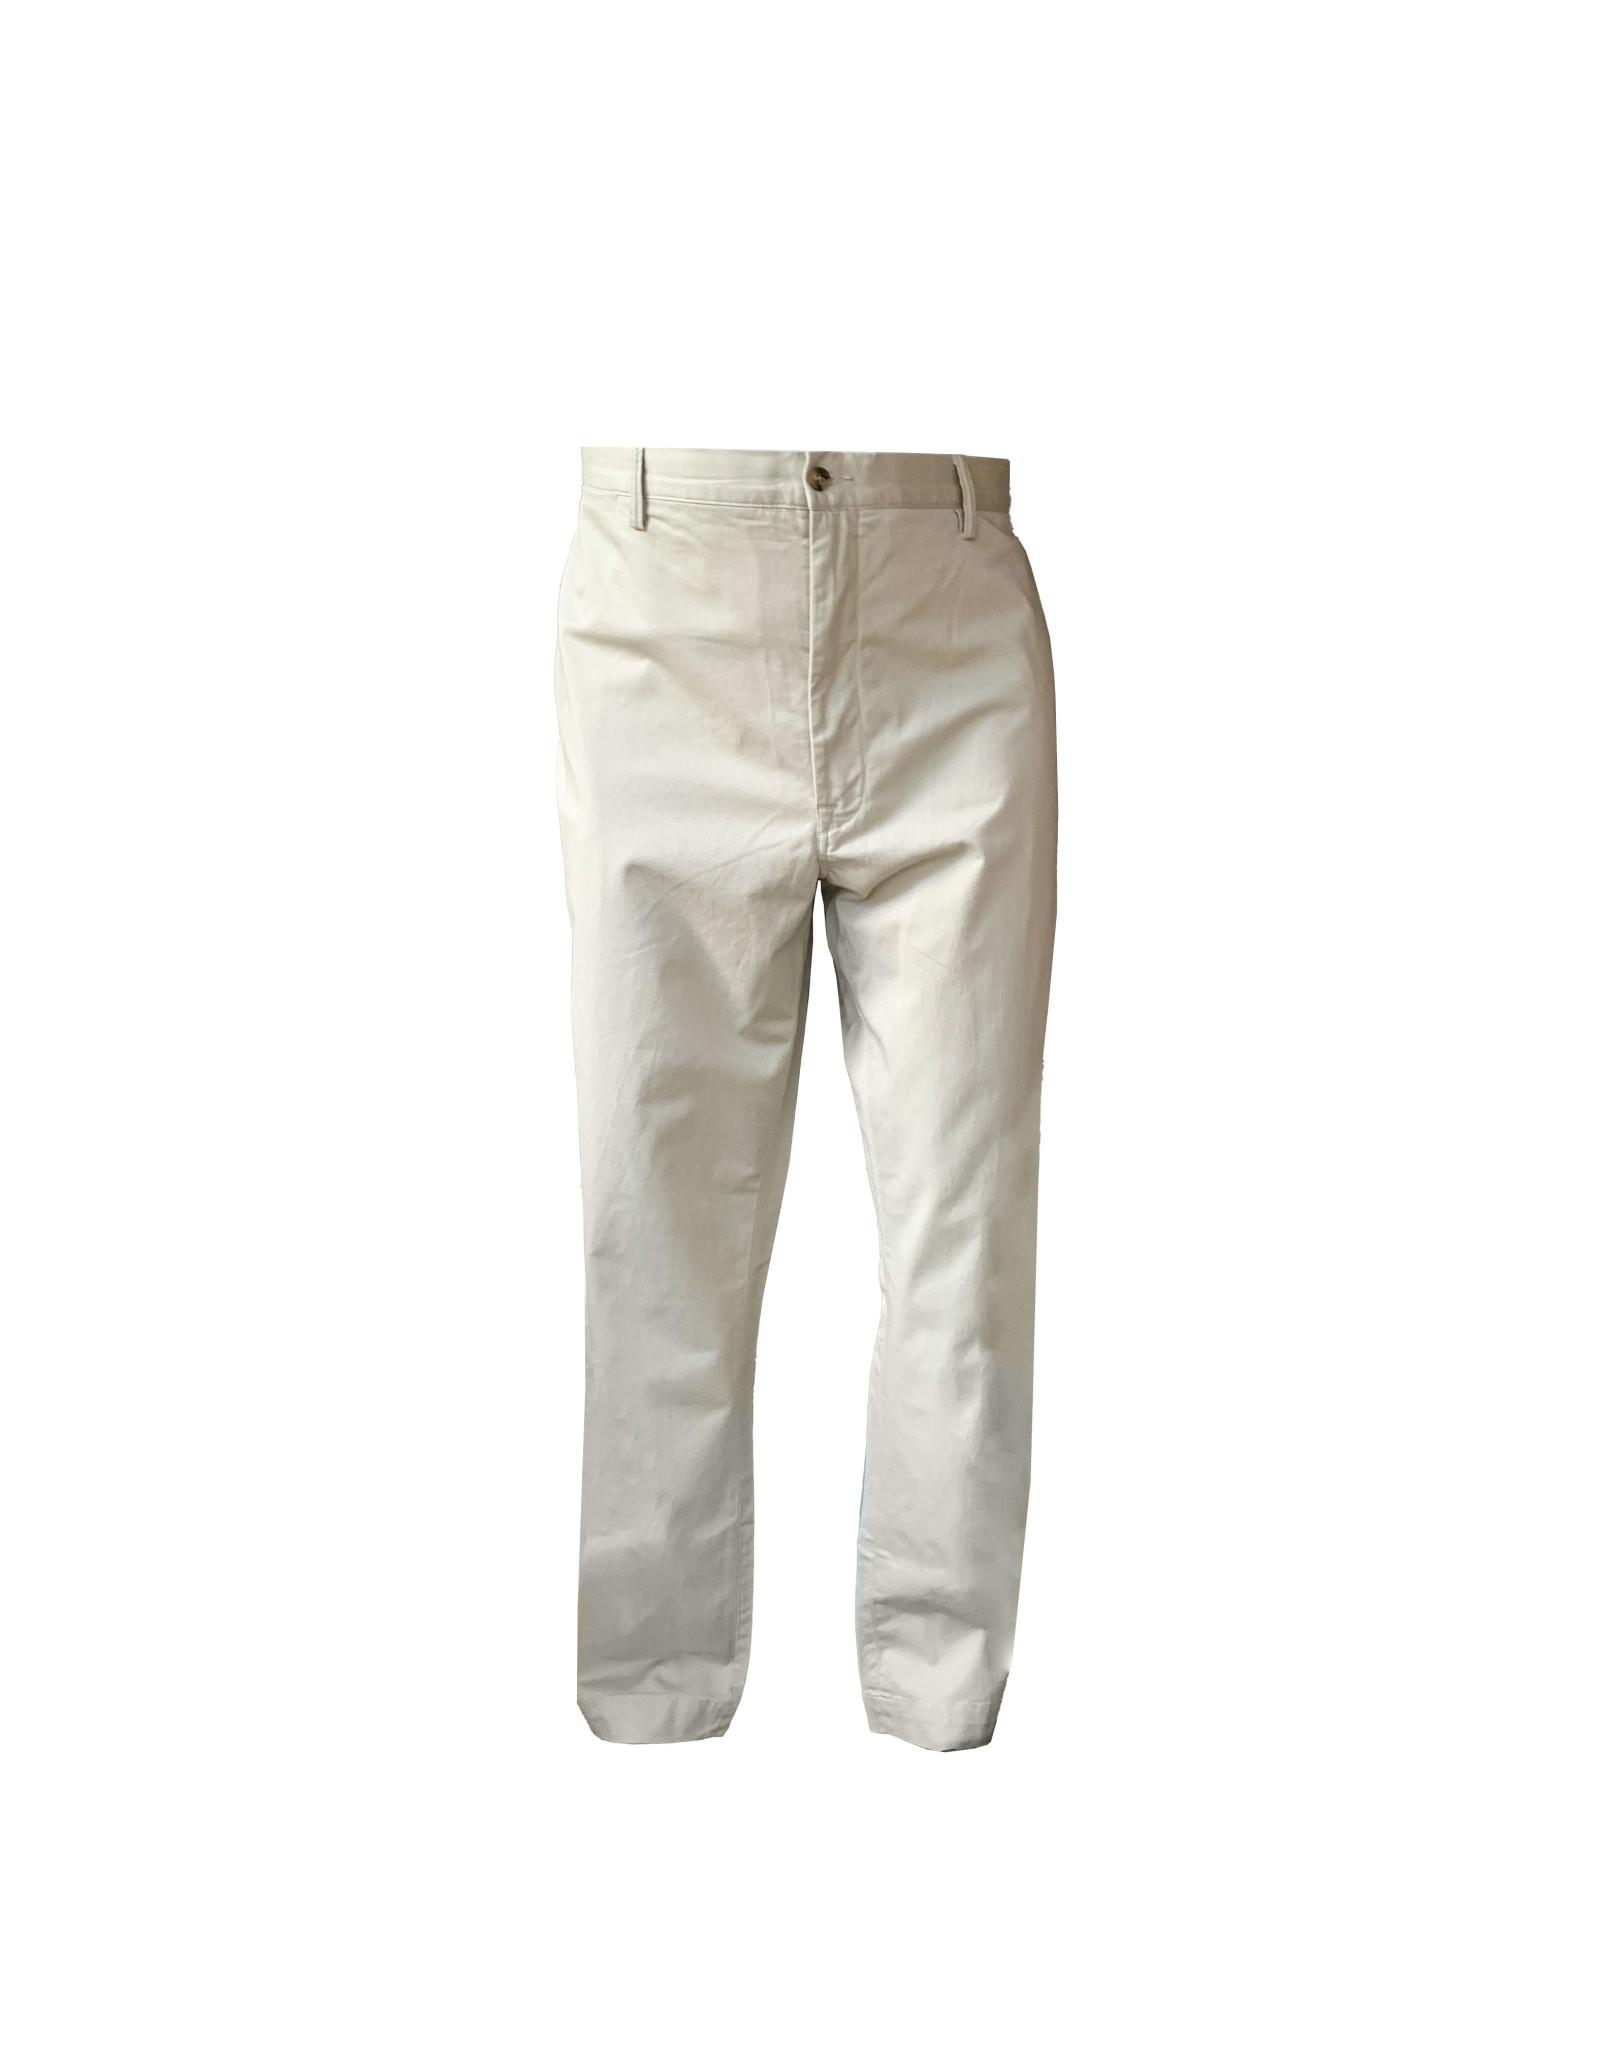 POLO RALPH LAUREN POLO RALPH LAUREN  Stretch Classic  Fit   Pants Size 54B/32